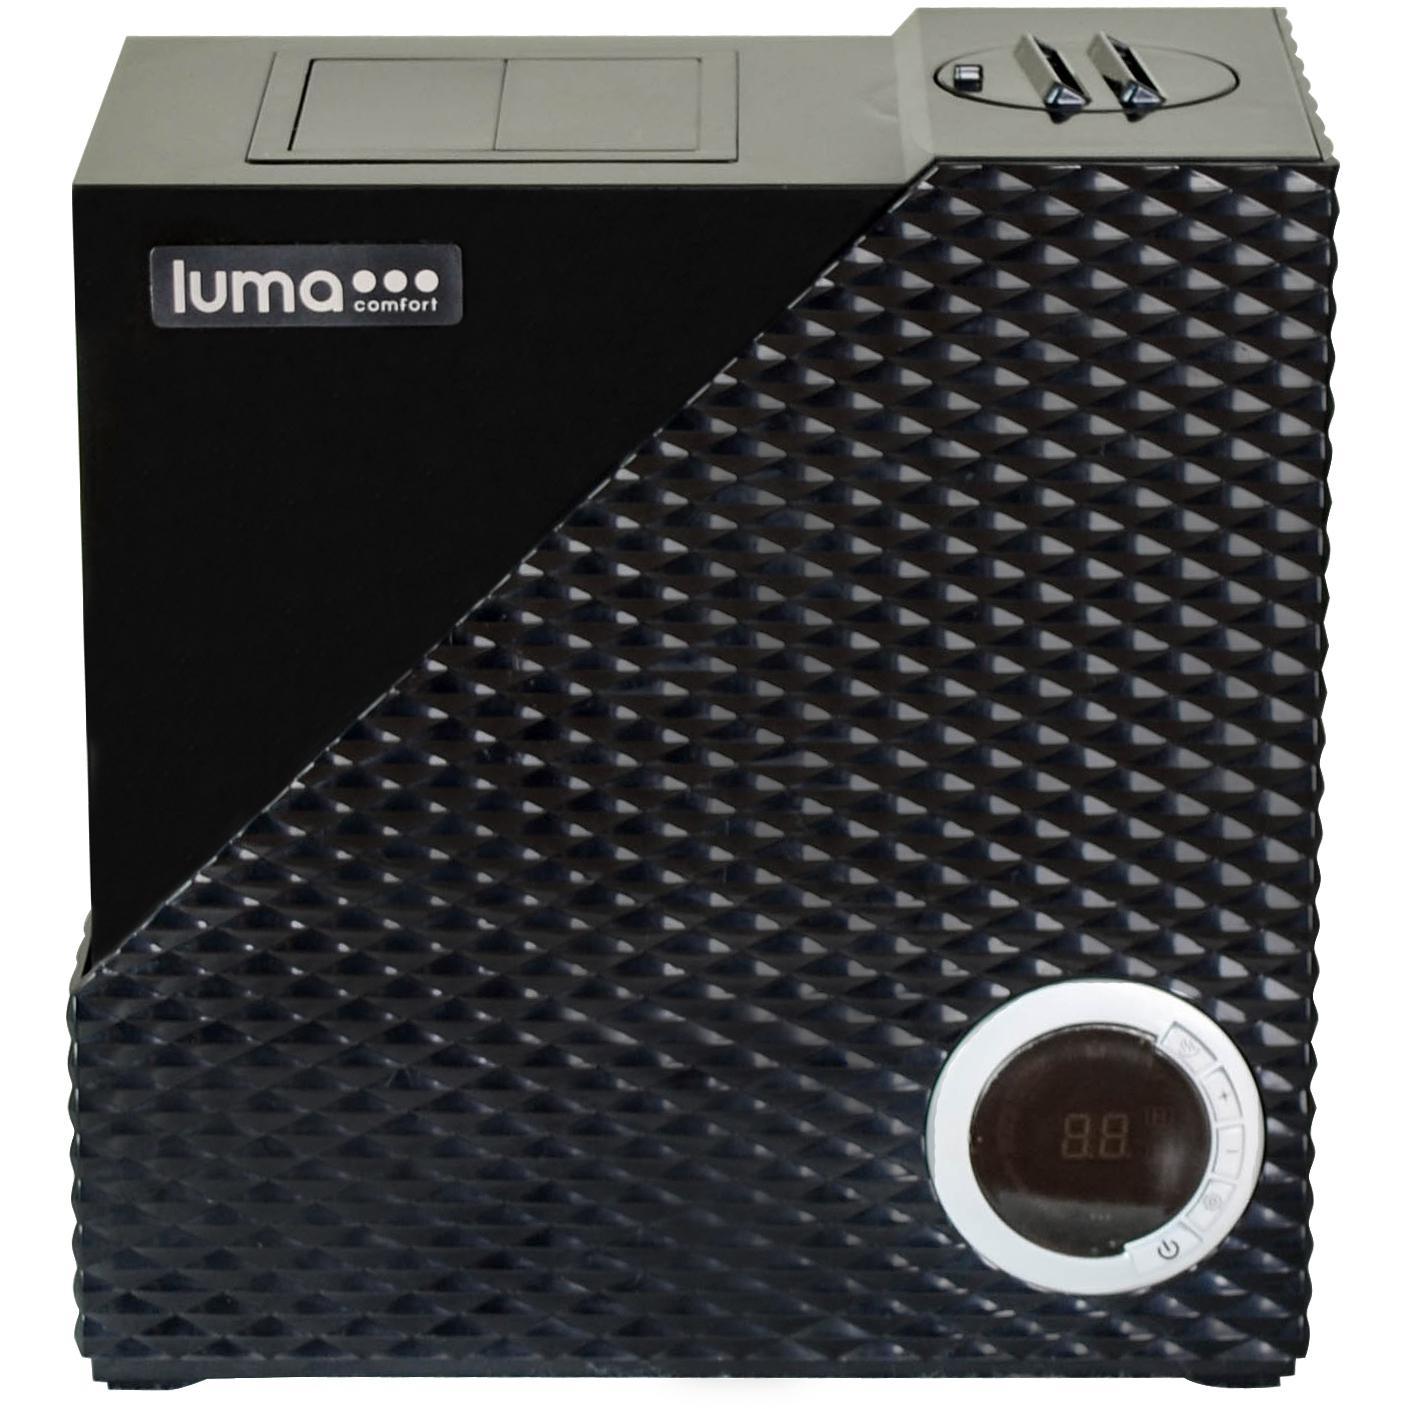 Luma Comfort 538 Sq. Ft. Cool And Warm Mist Humidifier - HCW10B